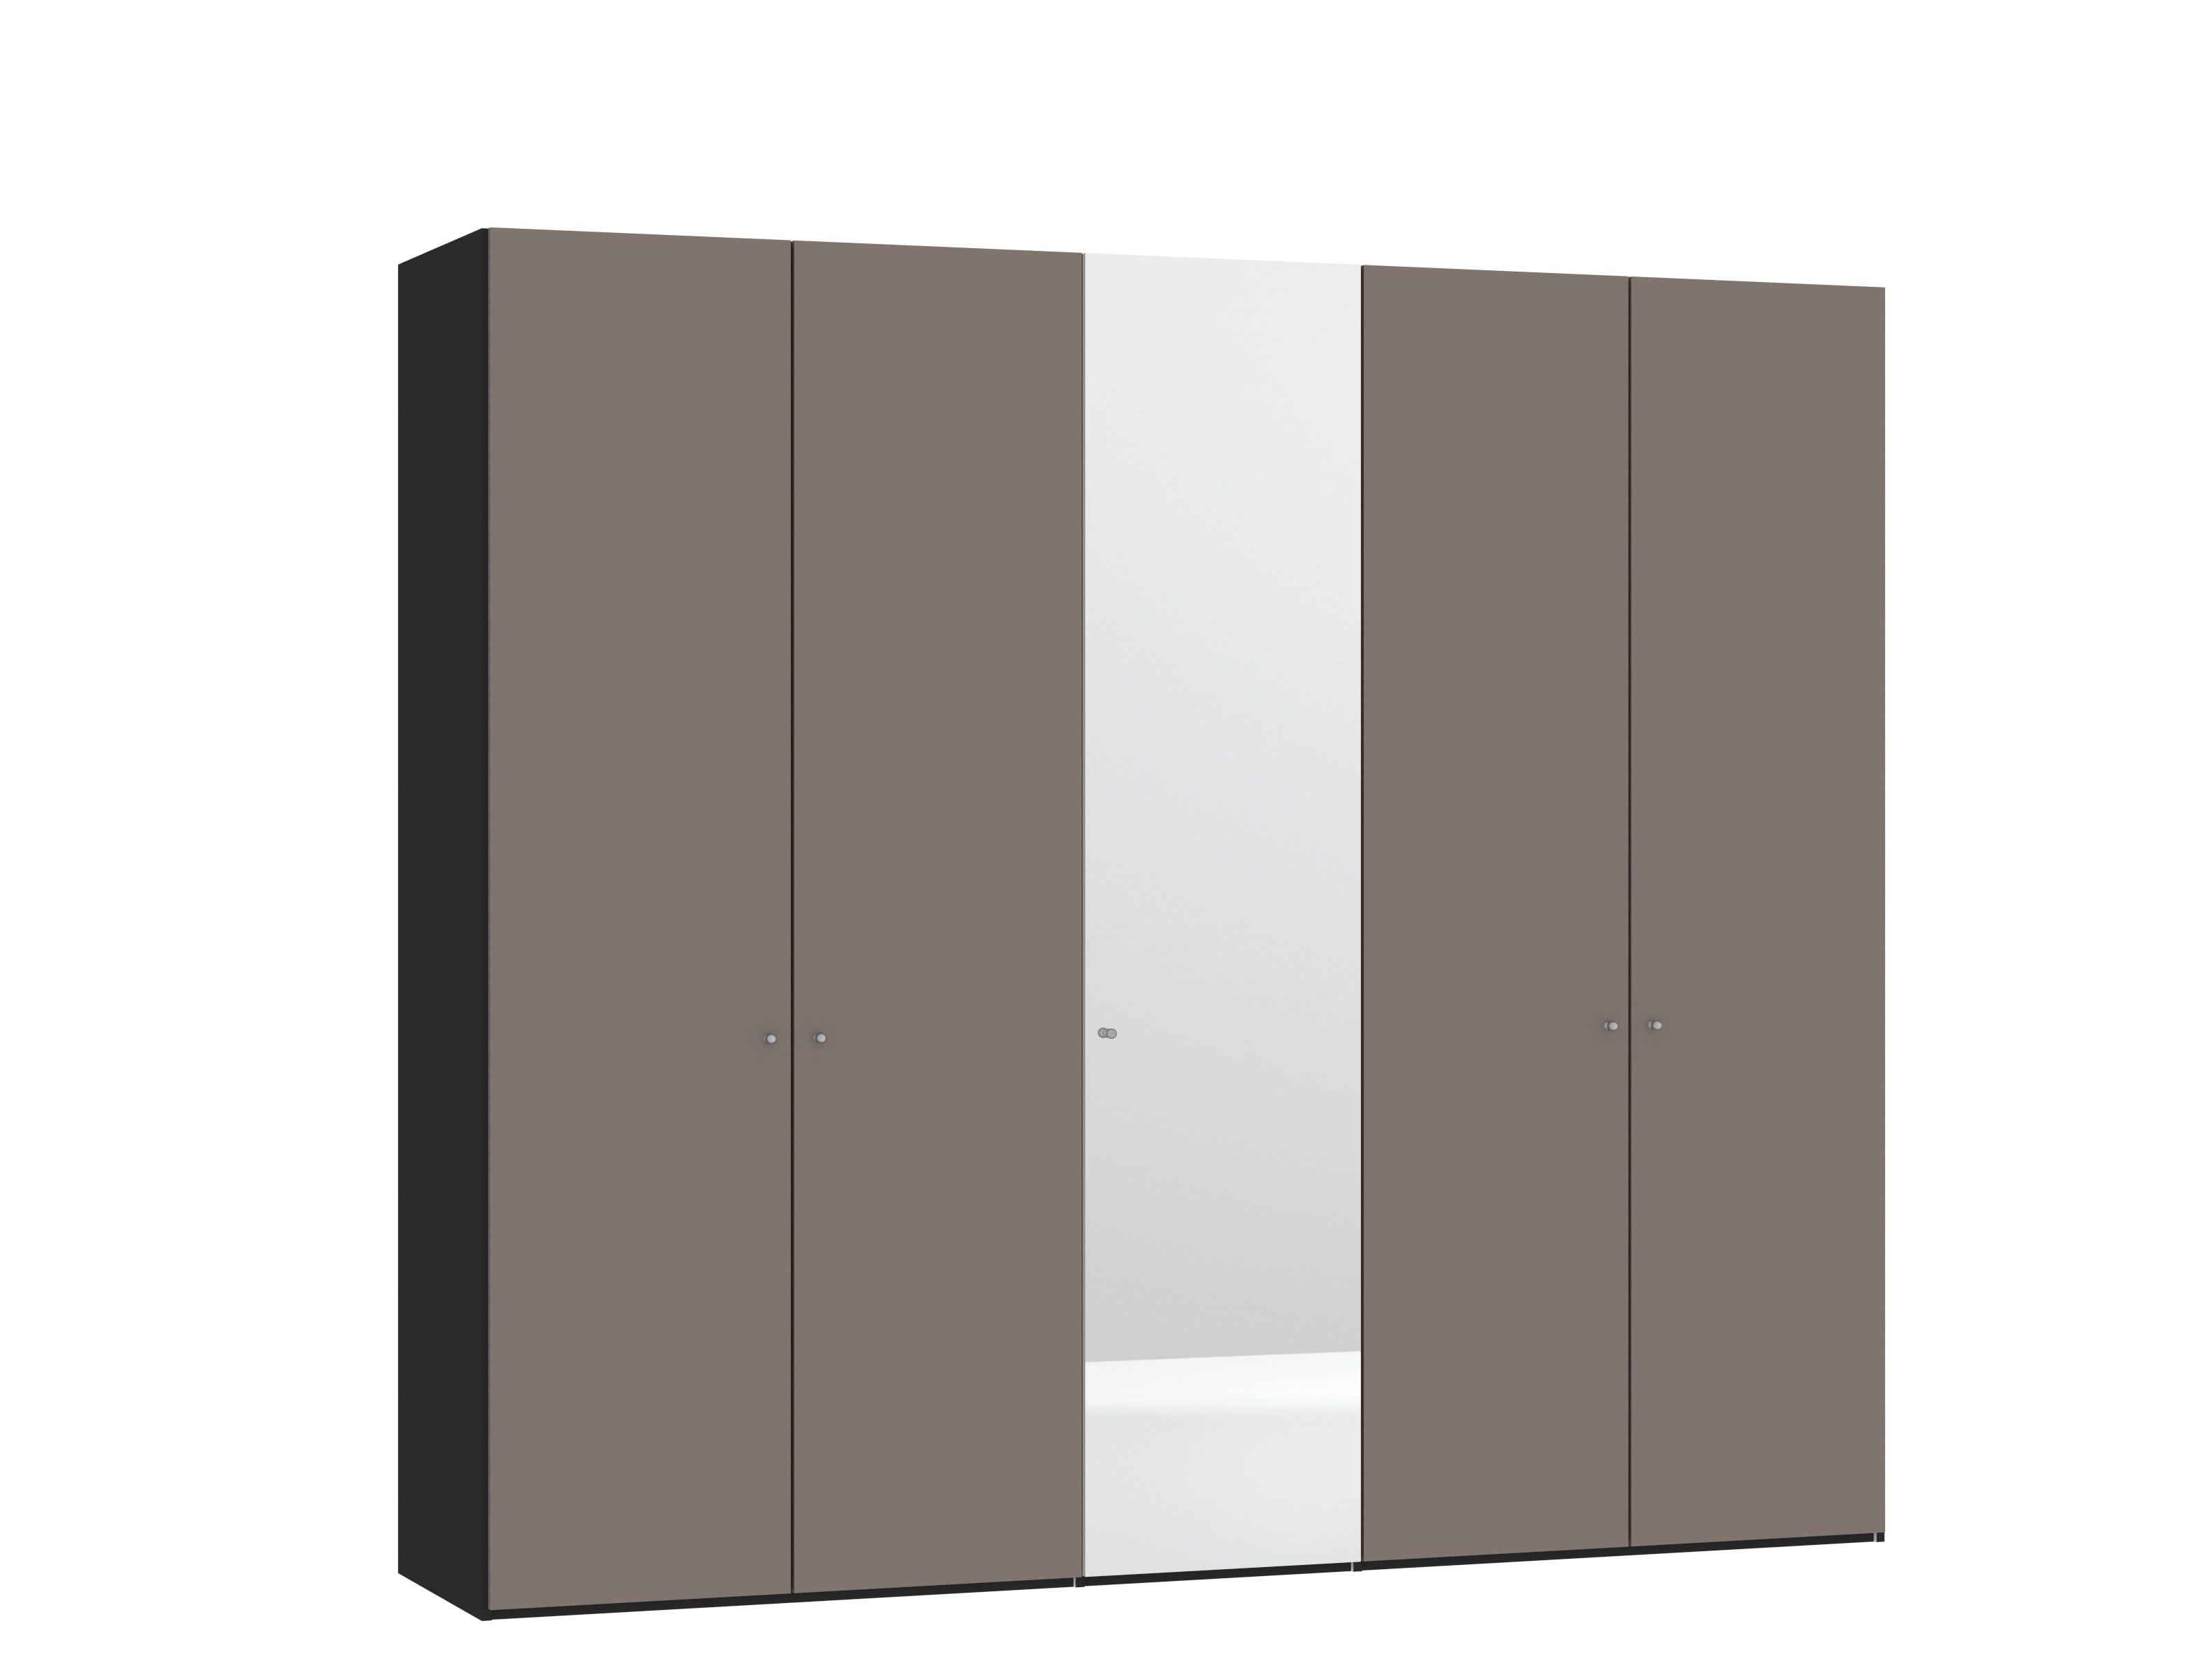 Grijze Slaapkamer Meubels : Slaapkamer meubels kledingkast basalt grijs meubel winkels